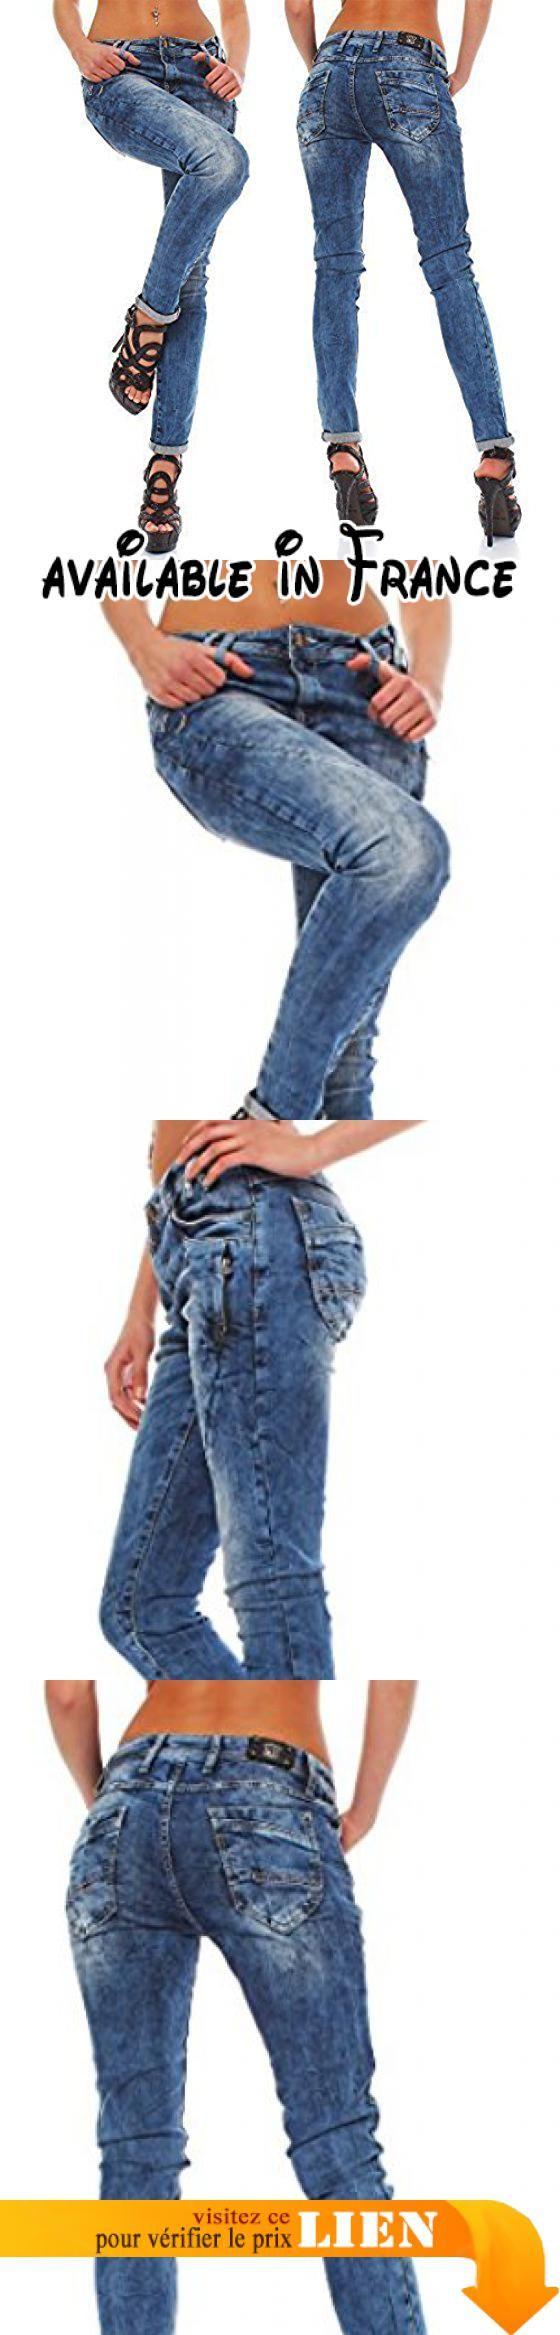 Femmes 0661 Jeans Pour Baxx Cbw B00viw7wvoCipoamp; Pantalon SVjUpLqMGz